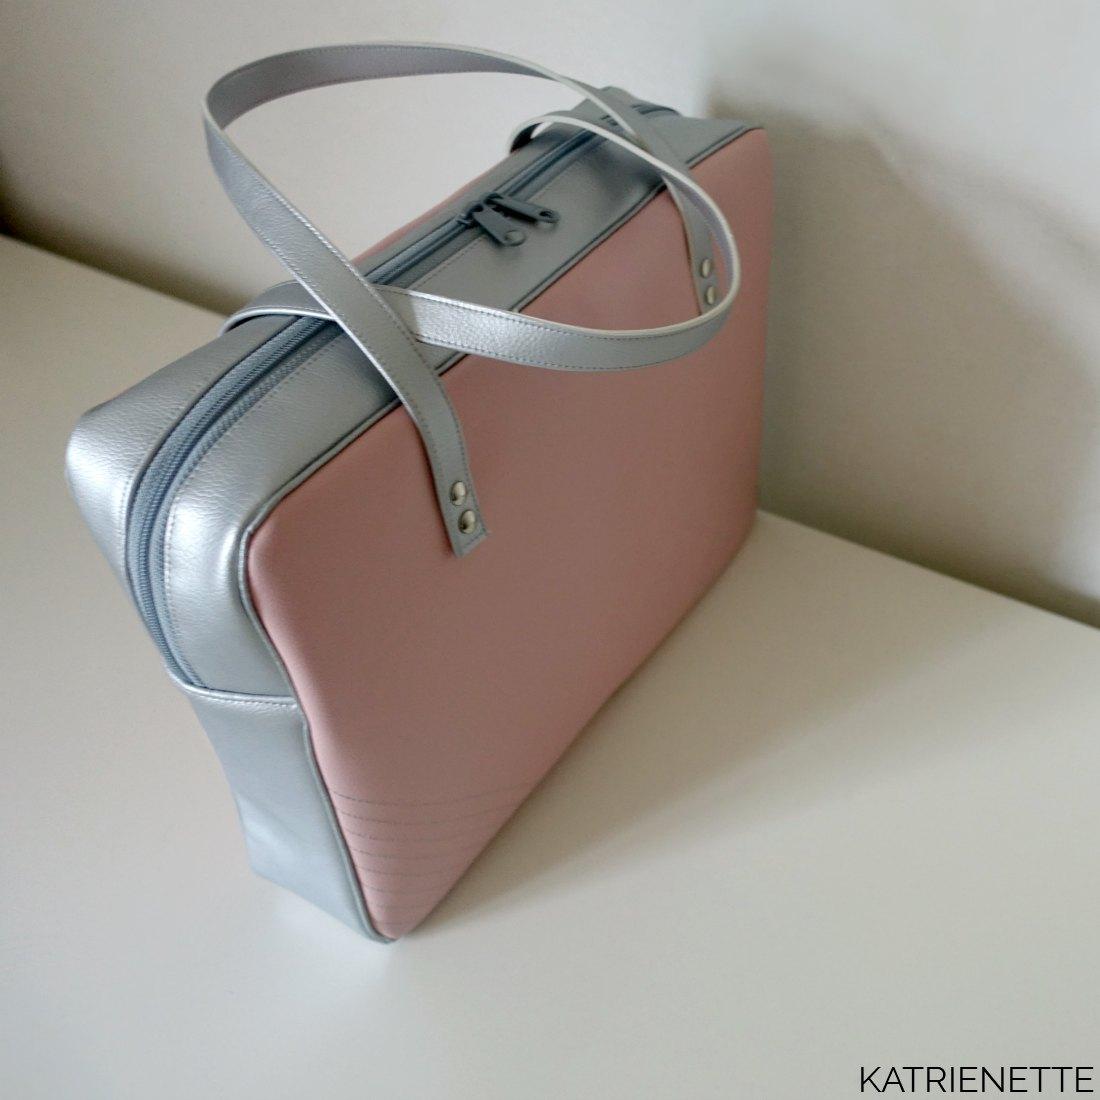 katrienette ida mijn tas naaien sewing bags bag tas let's sti(c)k together stik ls2gether stik belgique kunstleer k-bas kbas rivetten holnieten stik-belgique margueritte michael miller werktas laptoptas laptop laptopbag